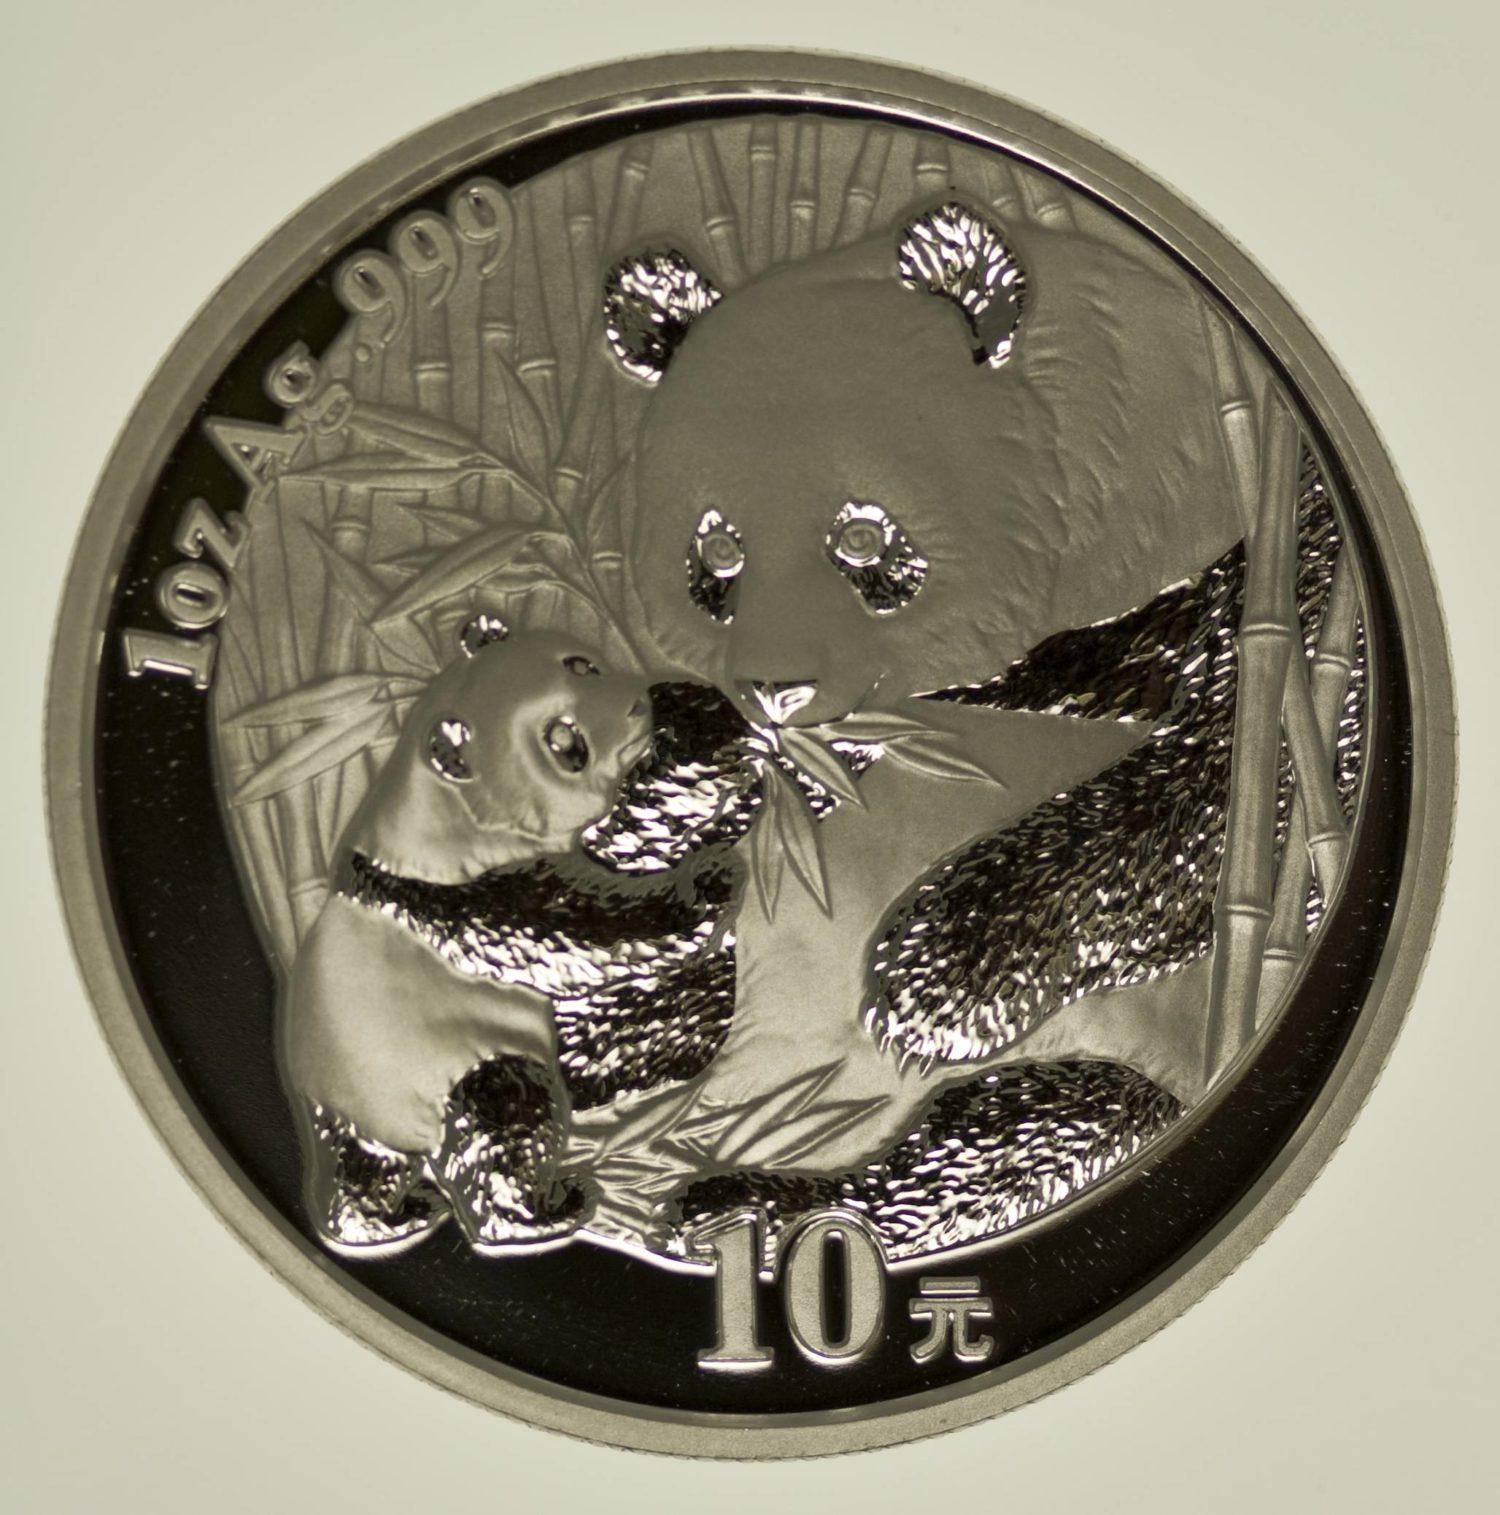 1 Unze Silbermünze China Panda 2005 10 Yuan 31,1 Gramm Silber RAR